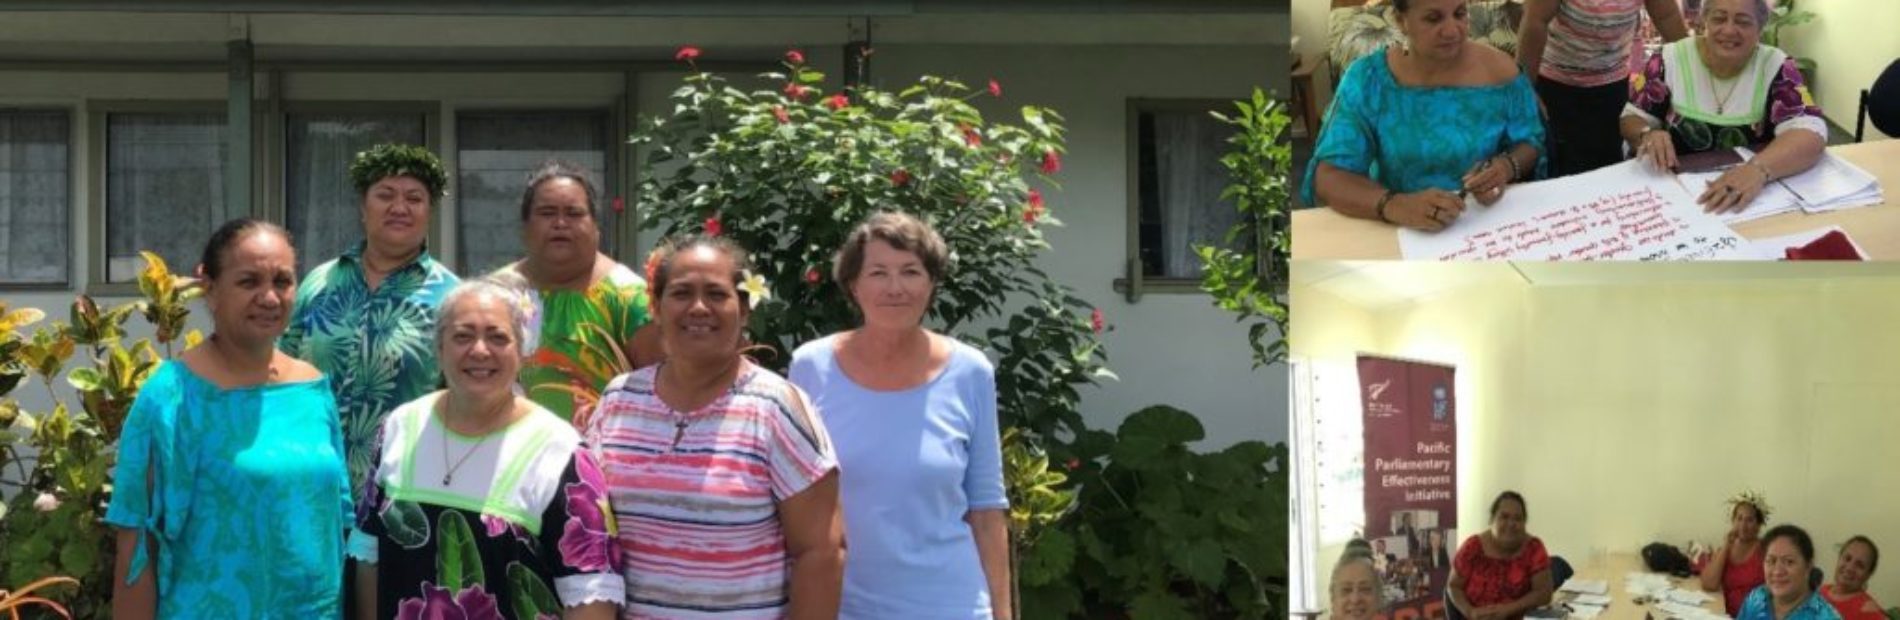 Cook Islands workshop on development of Women Parliamentarians caucus, March 2018.